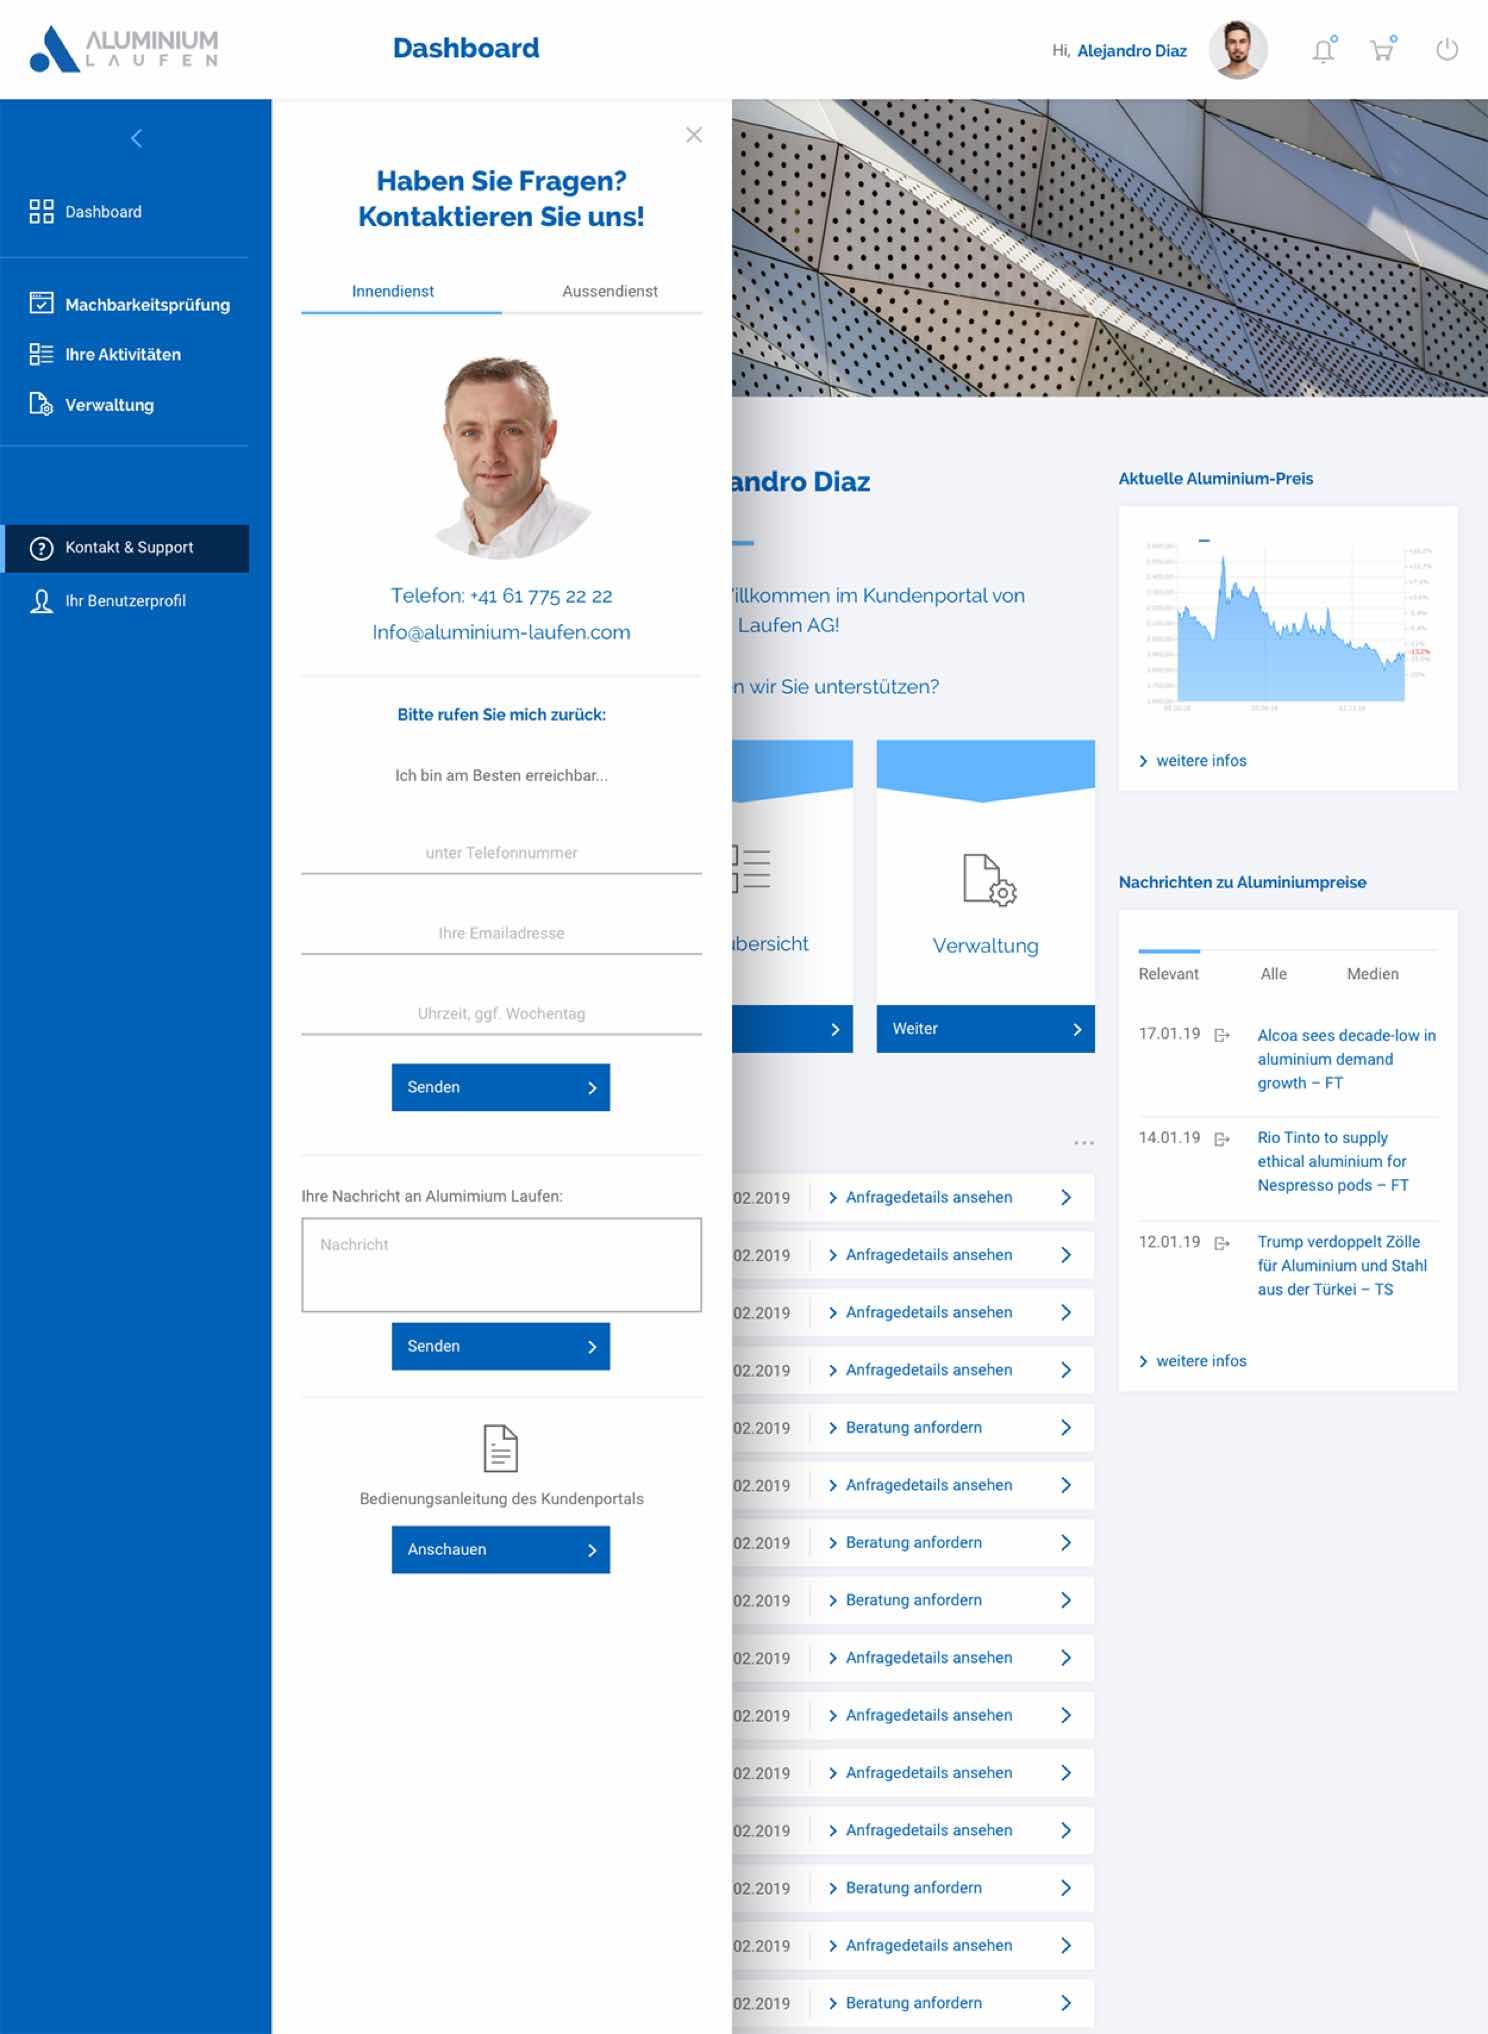 Visualisierung des Kundenportals von Aluminium Laufen